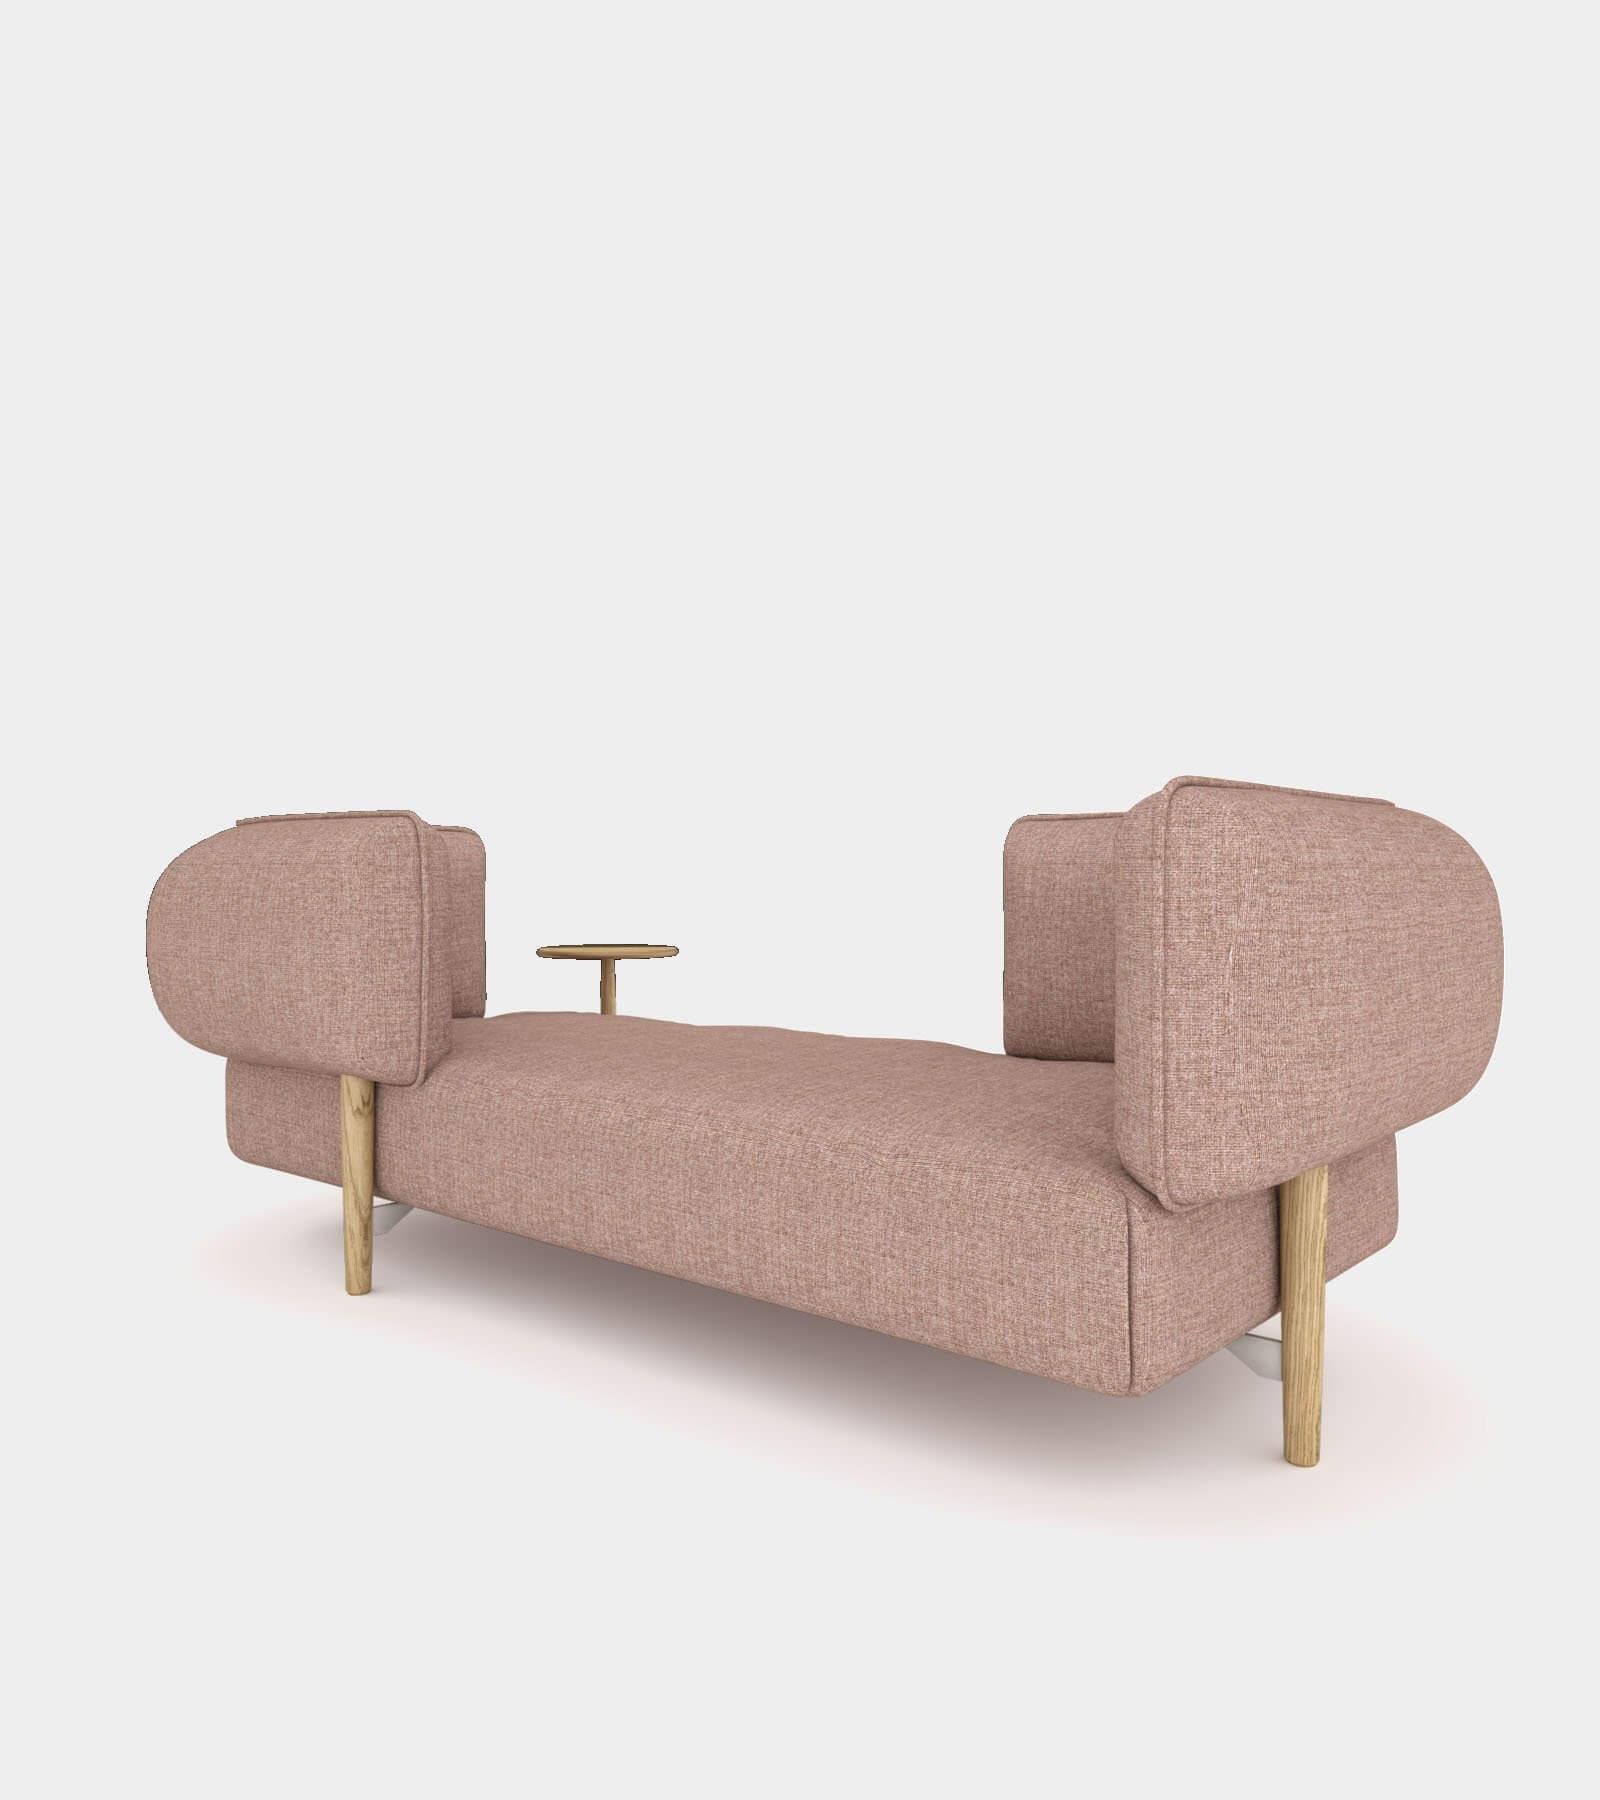 Modular fabric seat bench- 3D Model